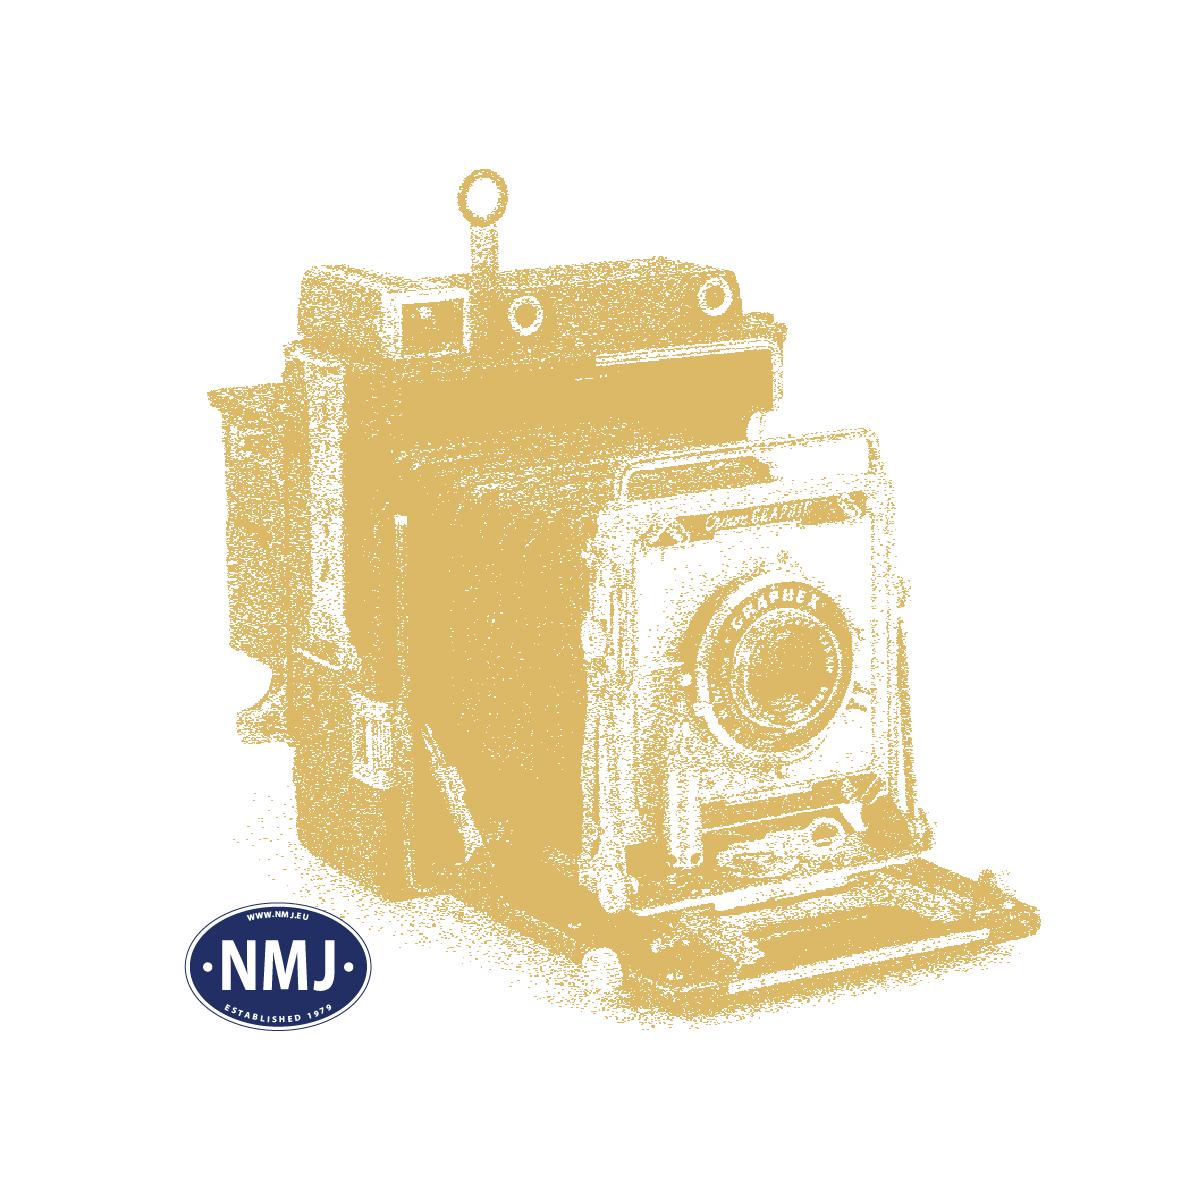 NMJH15113 - NMJ Skyline Undergang/Bro, Lys utgave, Ferdigmodell